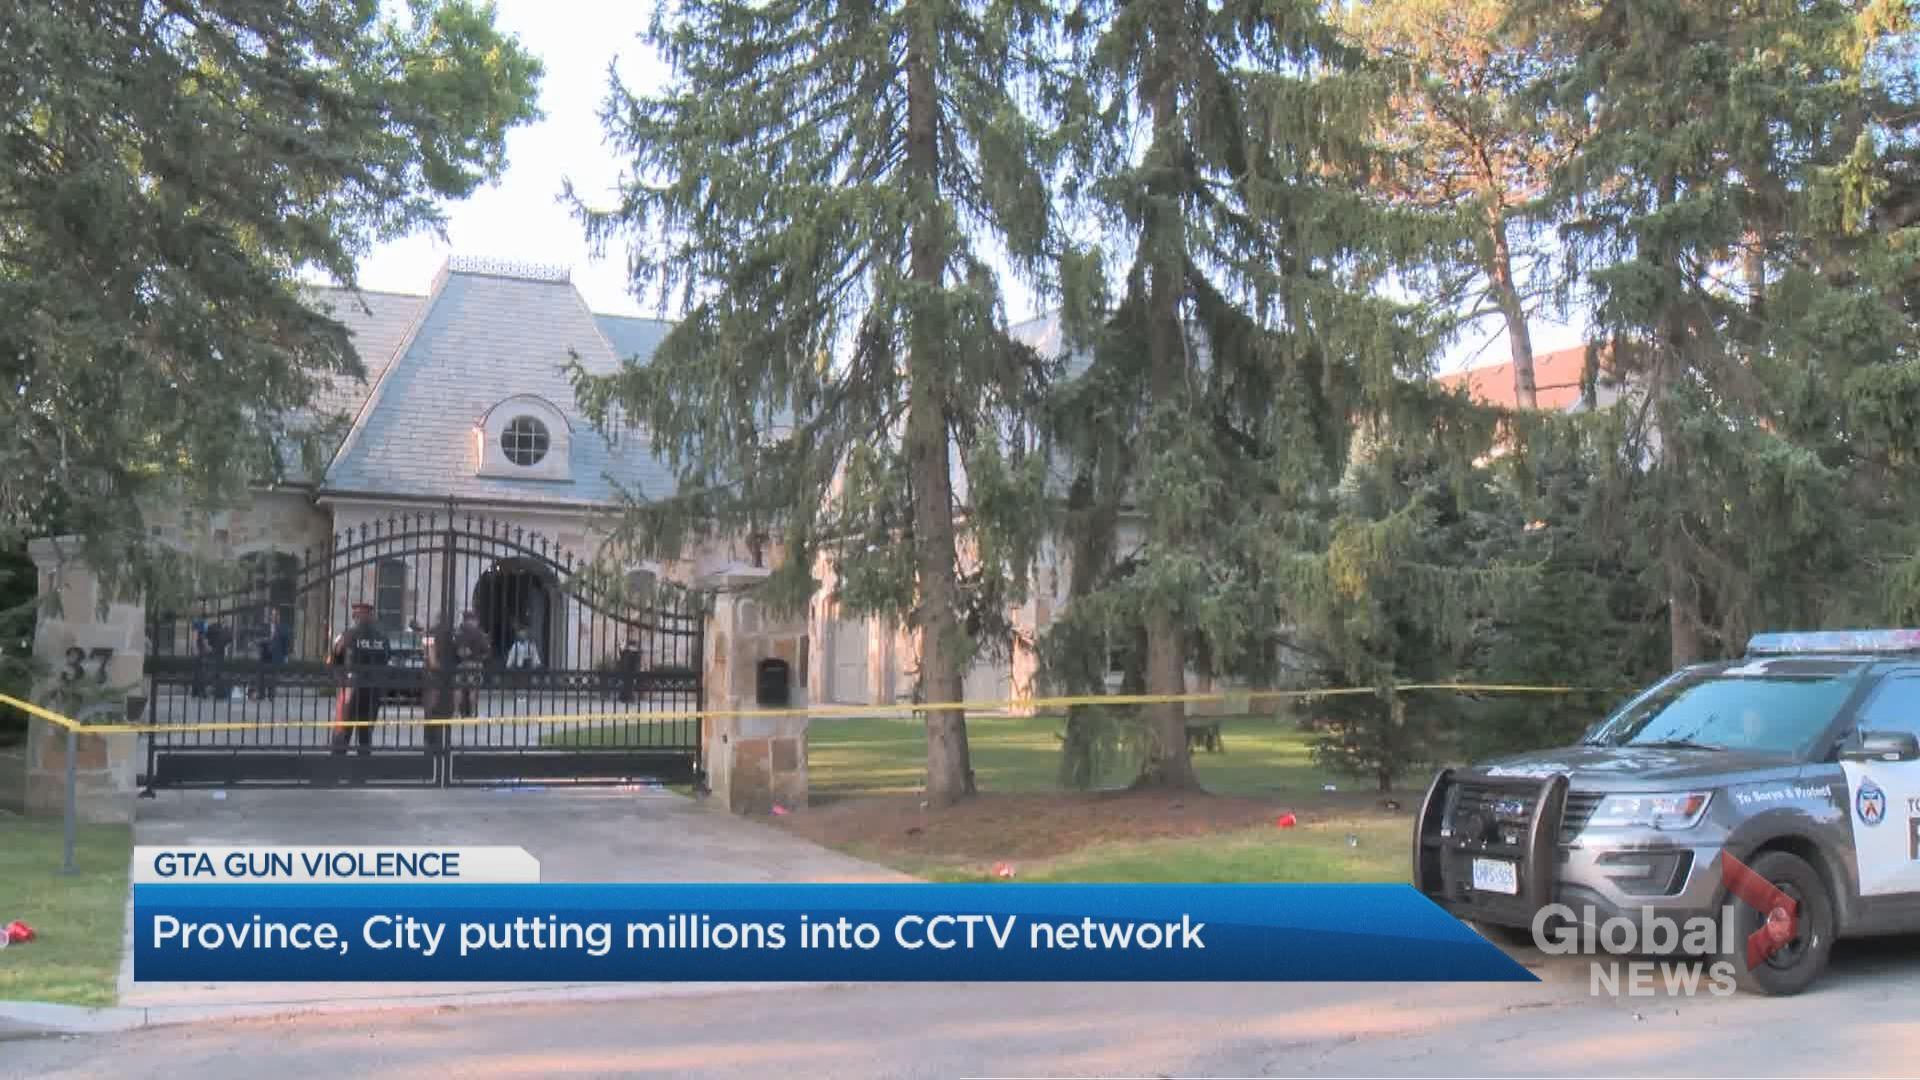 Ontario government provides Toronto police $3M to double CCTV cameras to combat gun